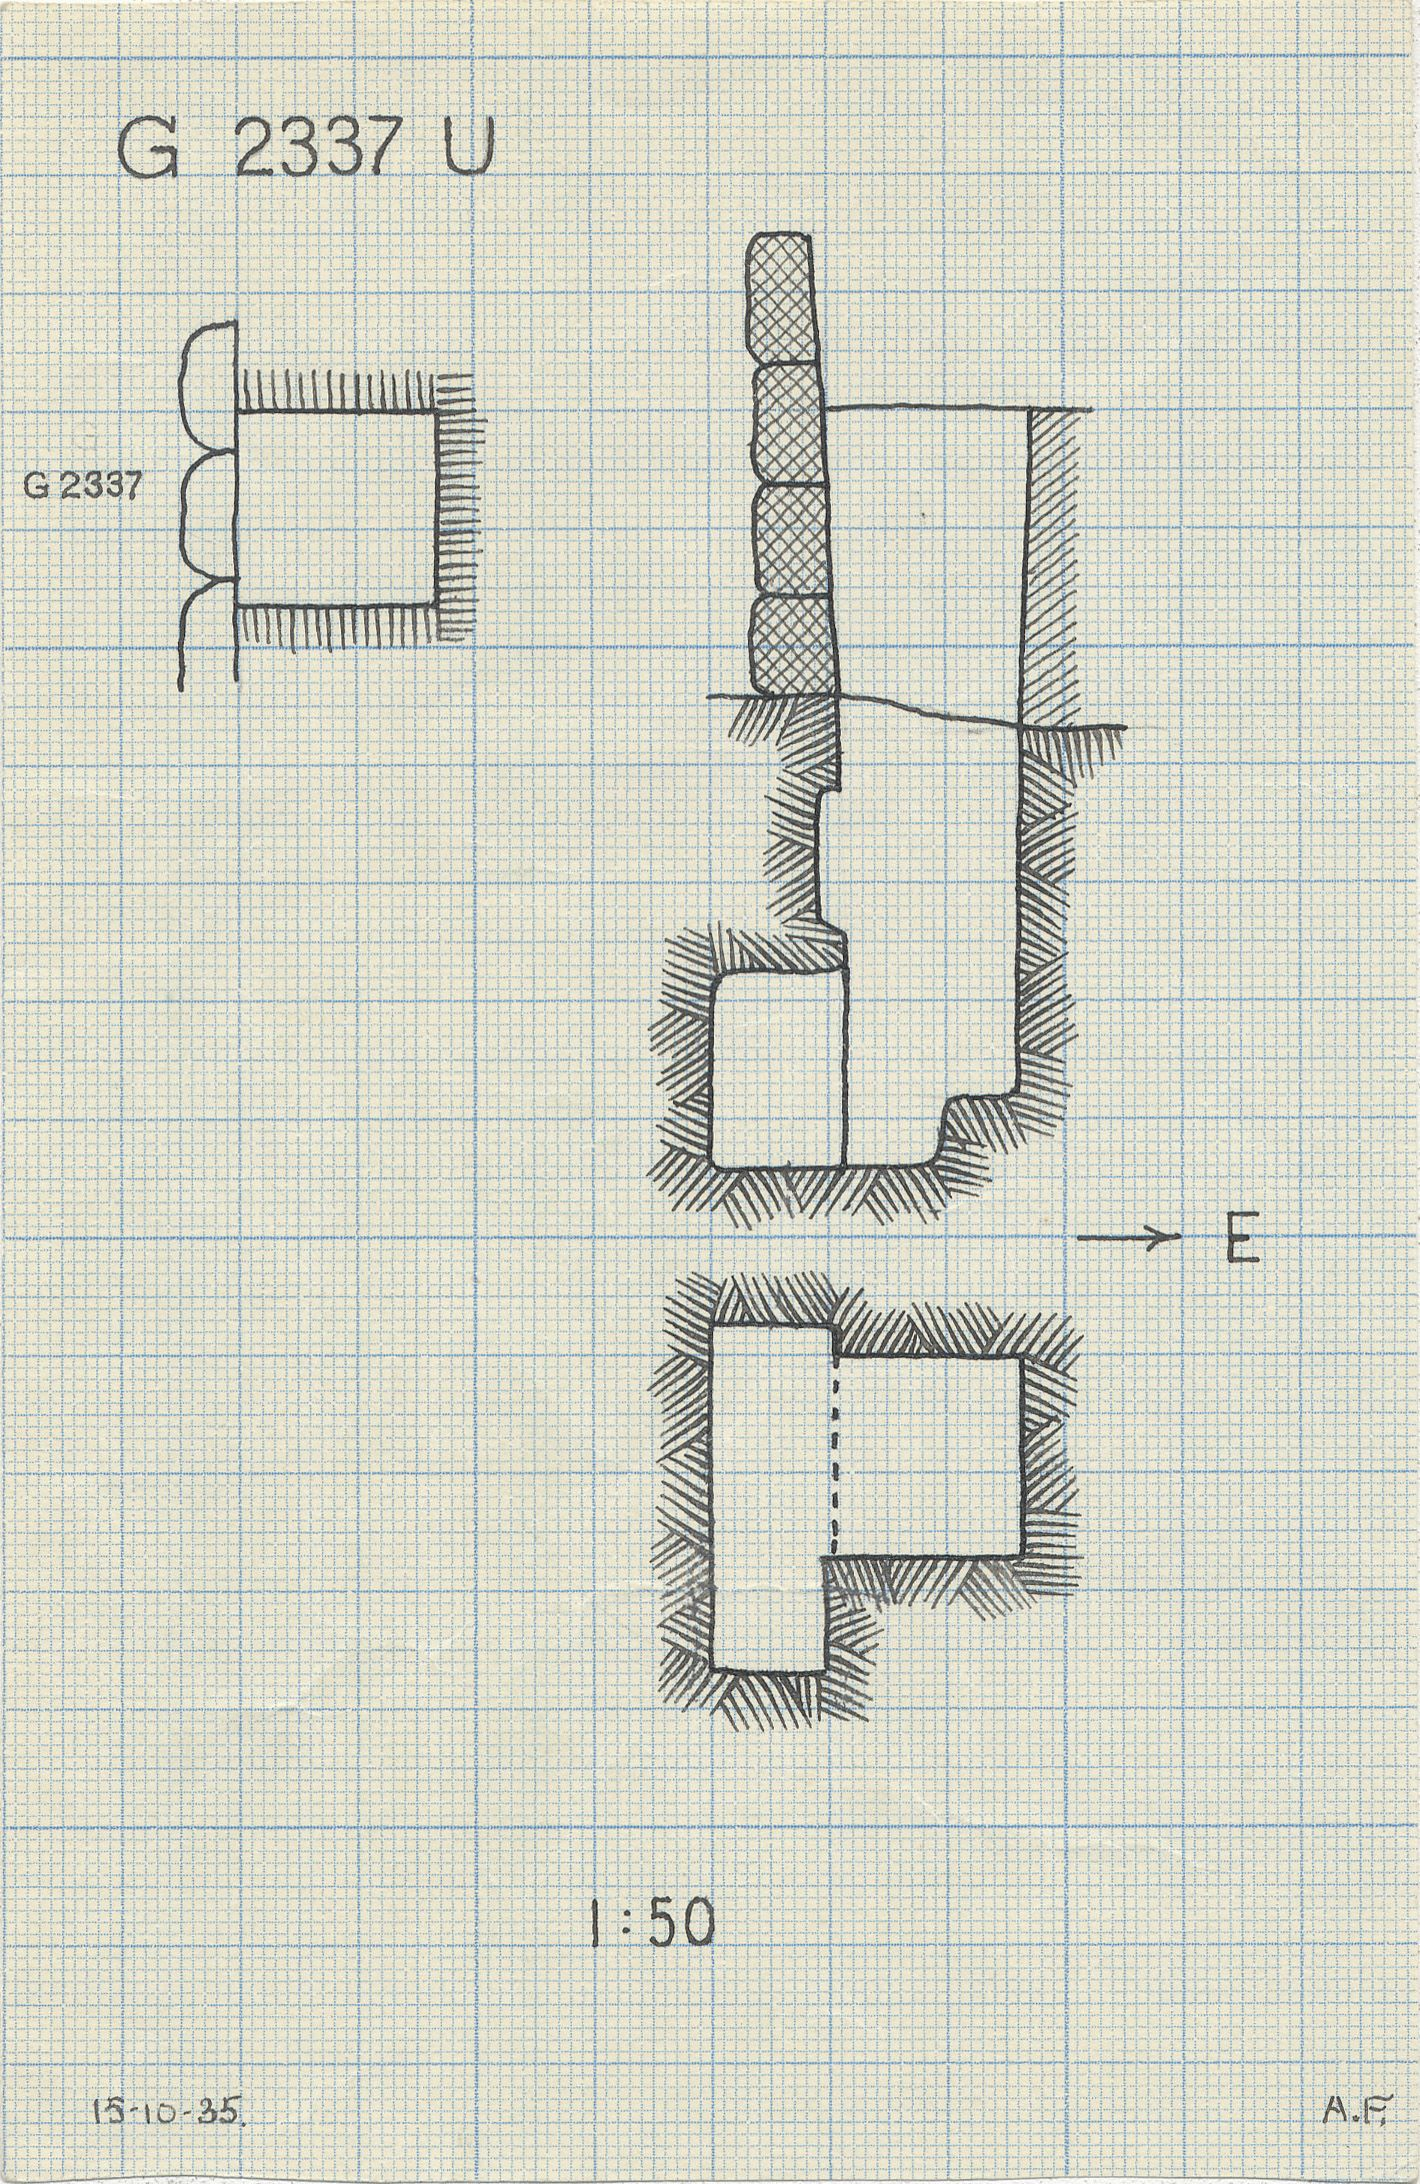 Maps and plans: G 2337, Shaft U